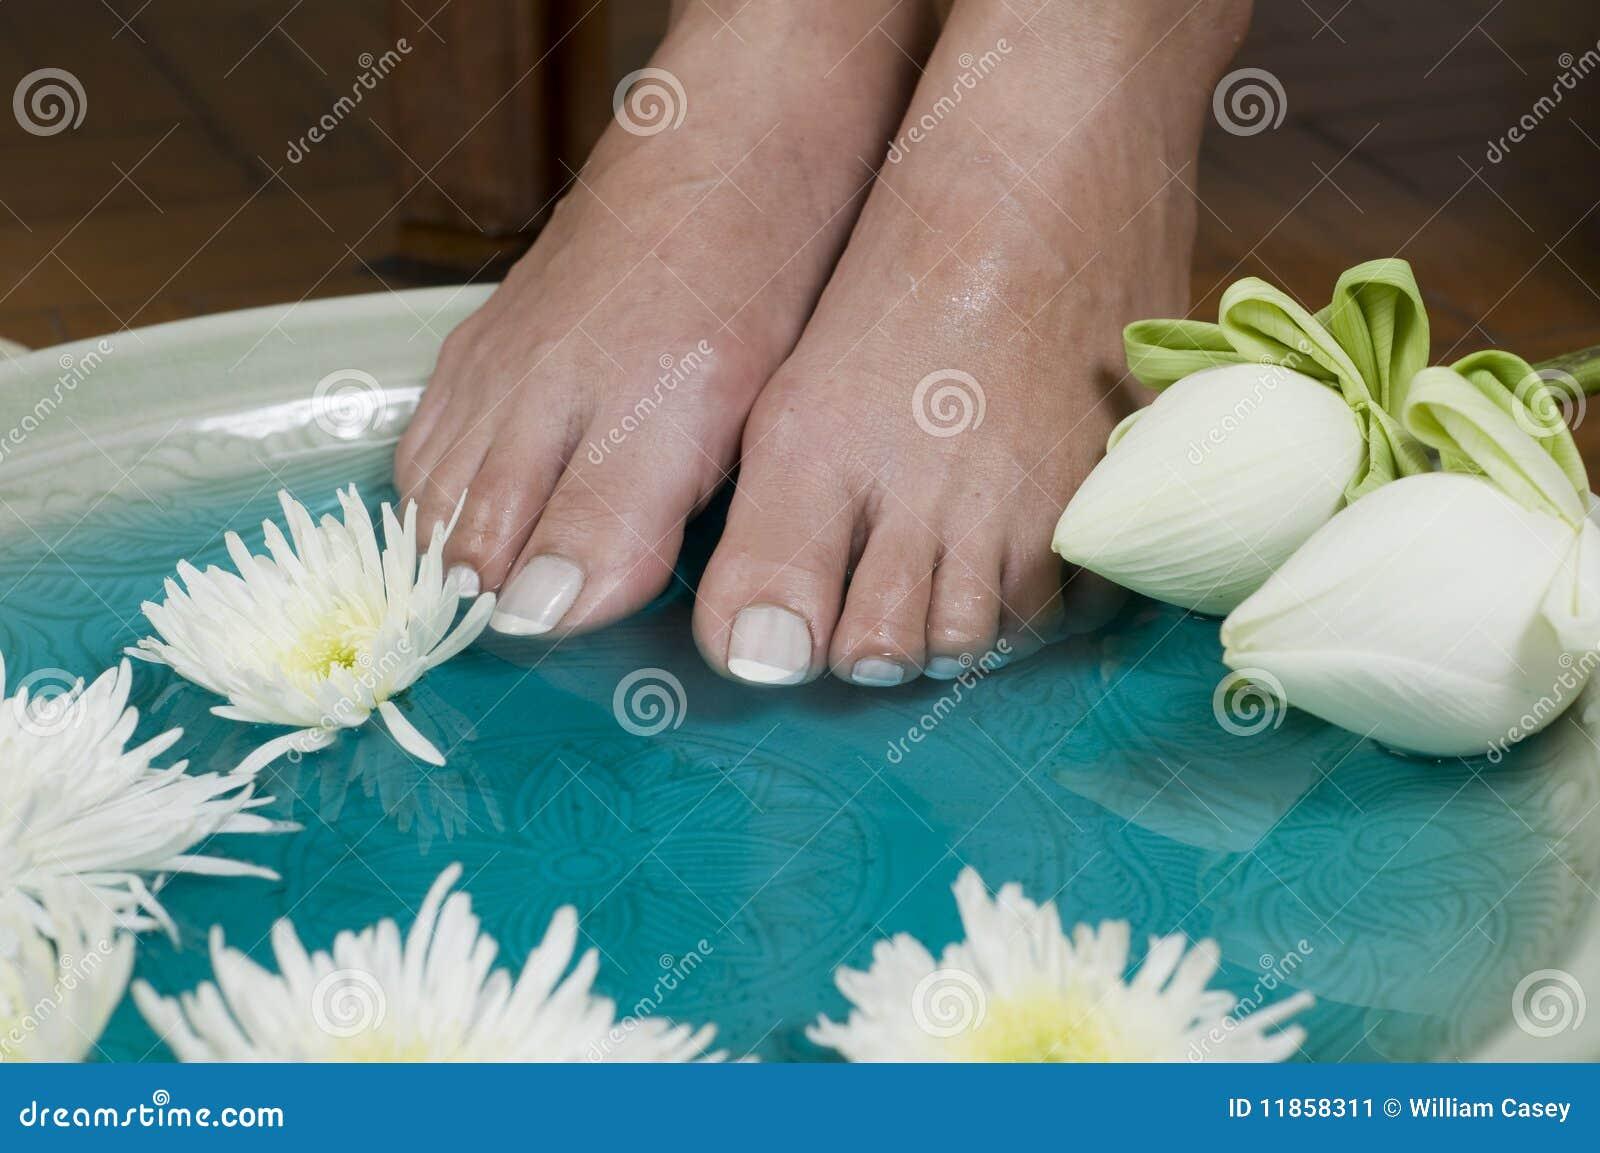 Lotus flower aromatherapy spa for feet 5 stock image image of lotus flower aromatherapy spa for feet 5 mightylinksfo